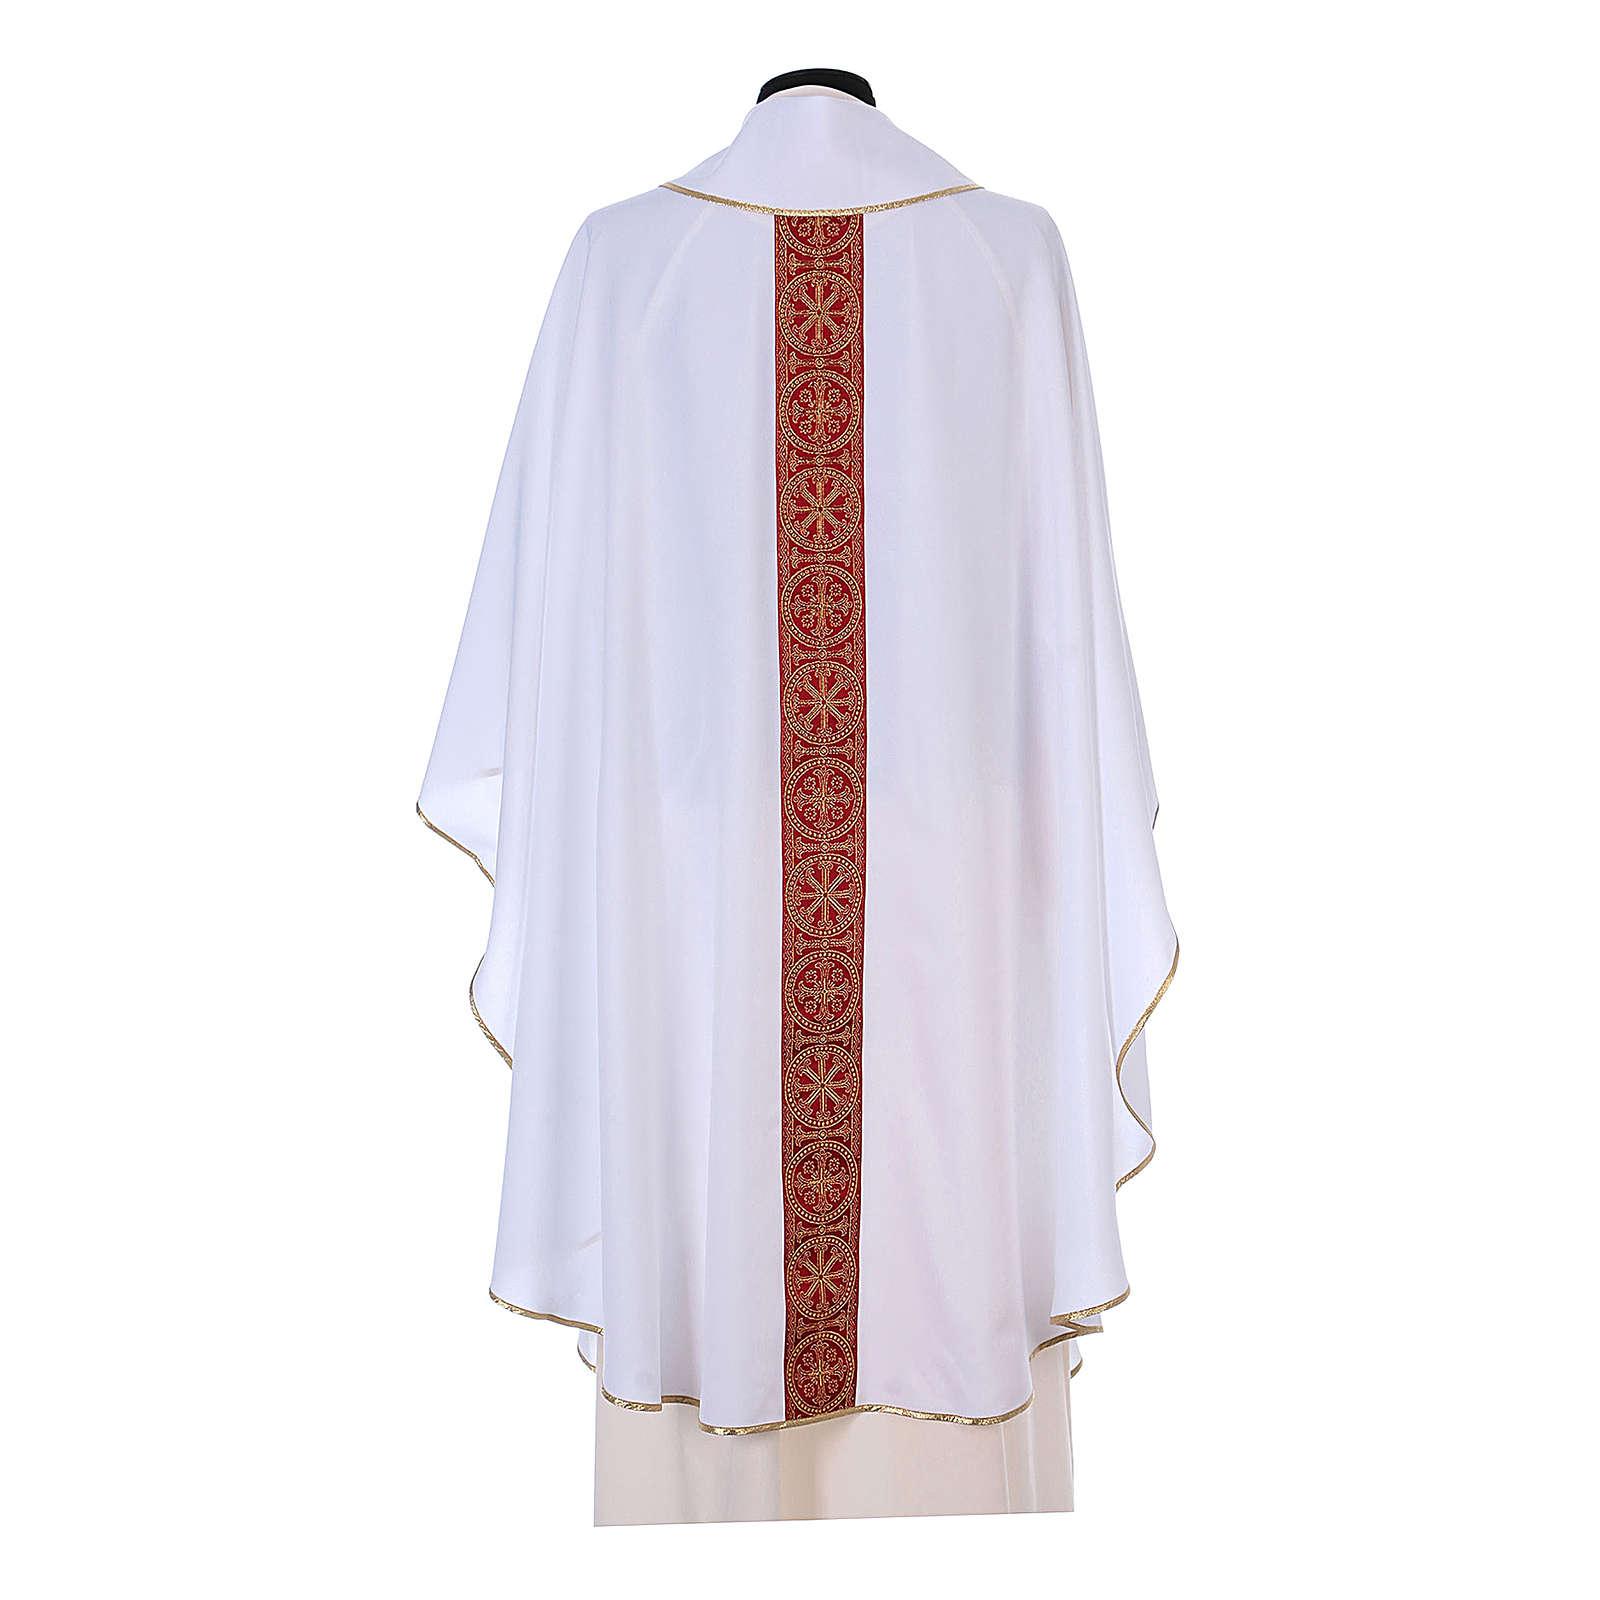 Chasuble bande avant arrière tissu Vatican 100% polyester 4